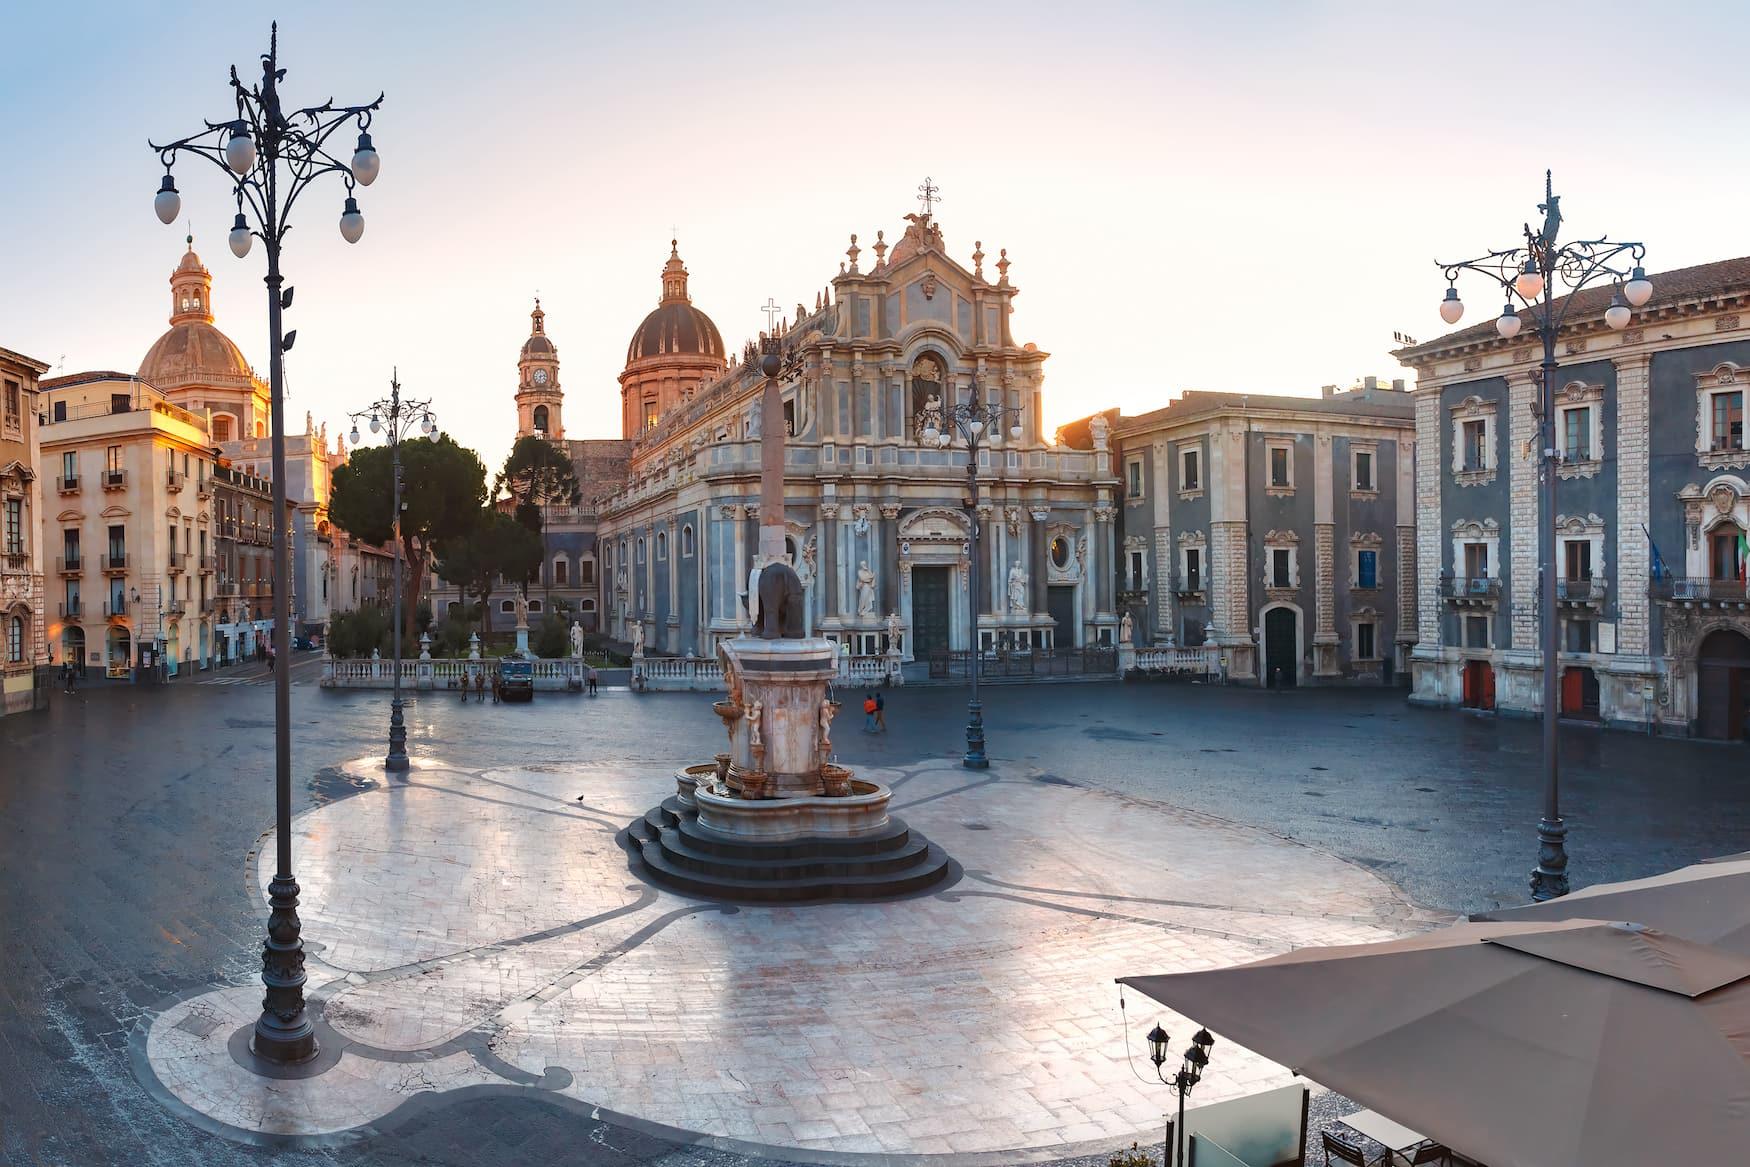 Piazza Duomo mit der Kathedrale St. Agatha in Catania